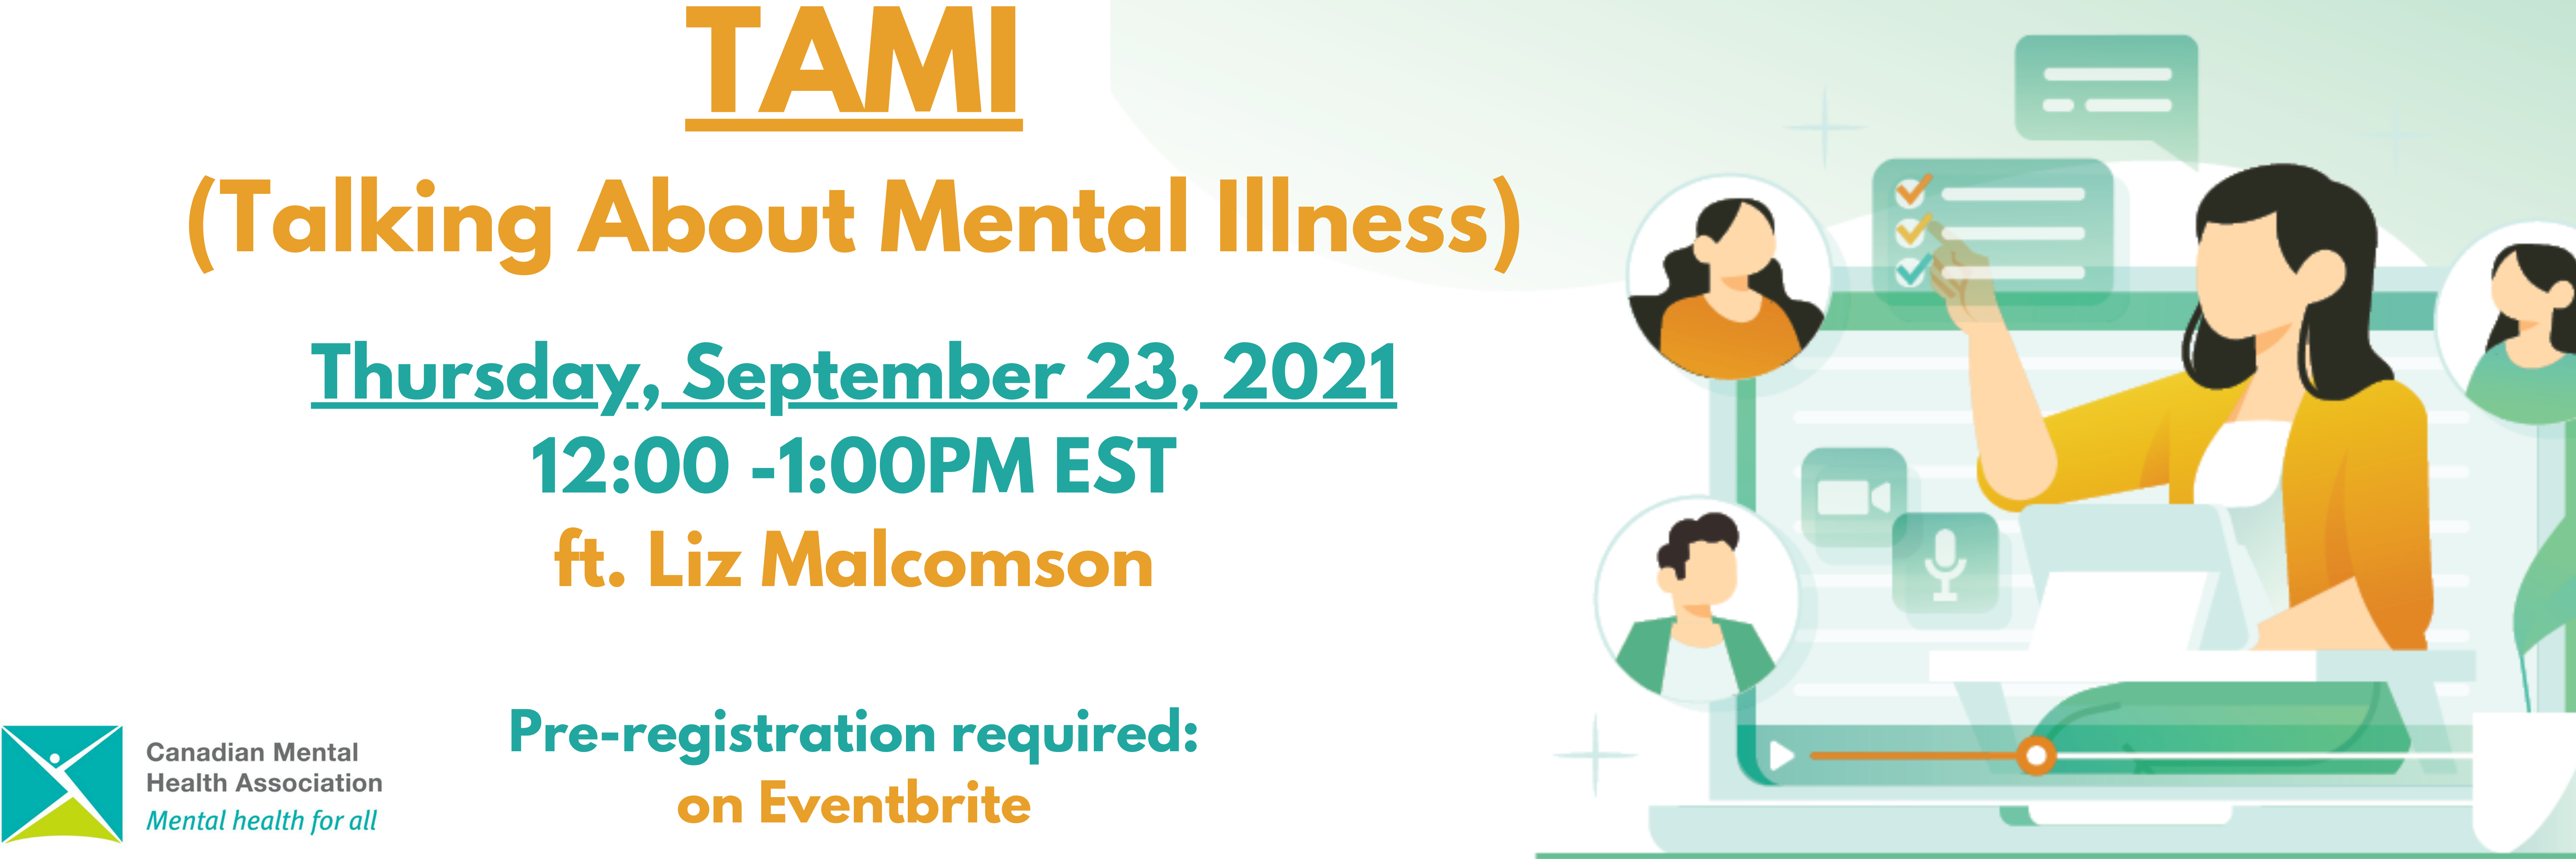 TAMI (Talking About Mental Illness) featuring Liz Malcomson